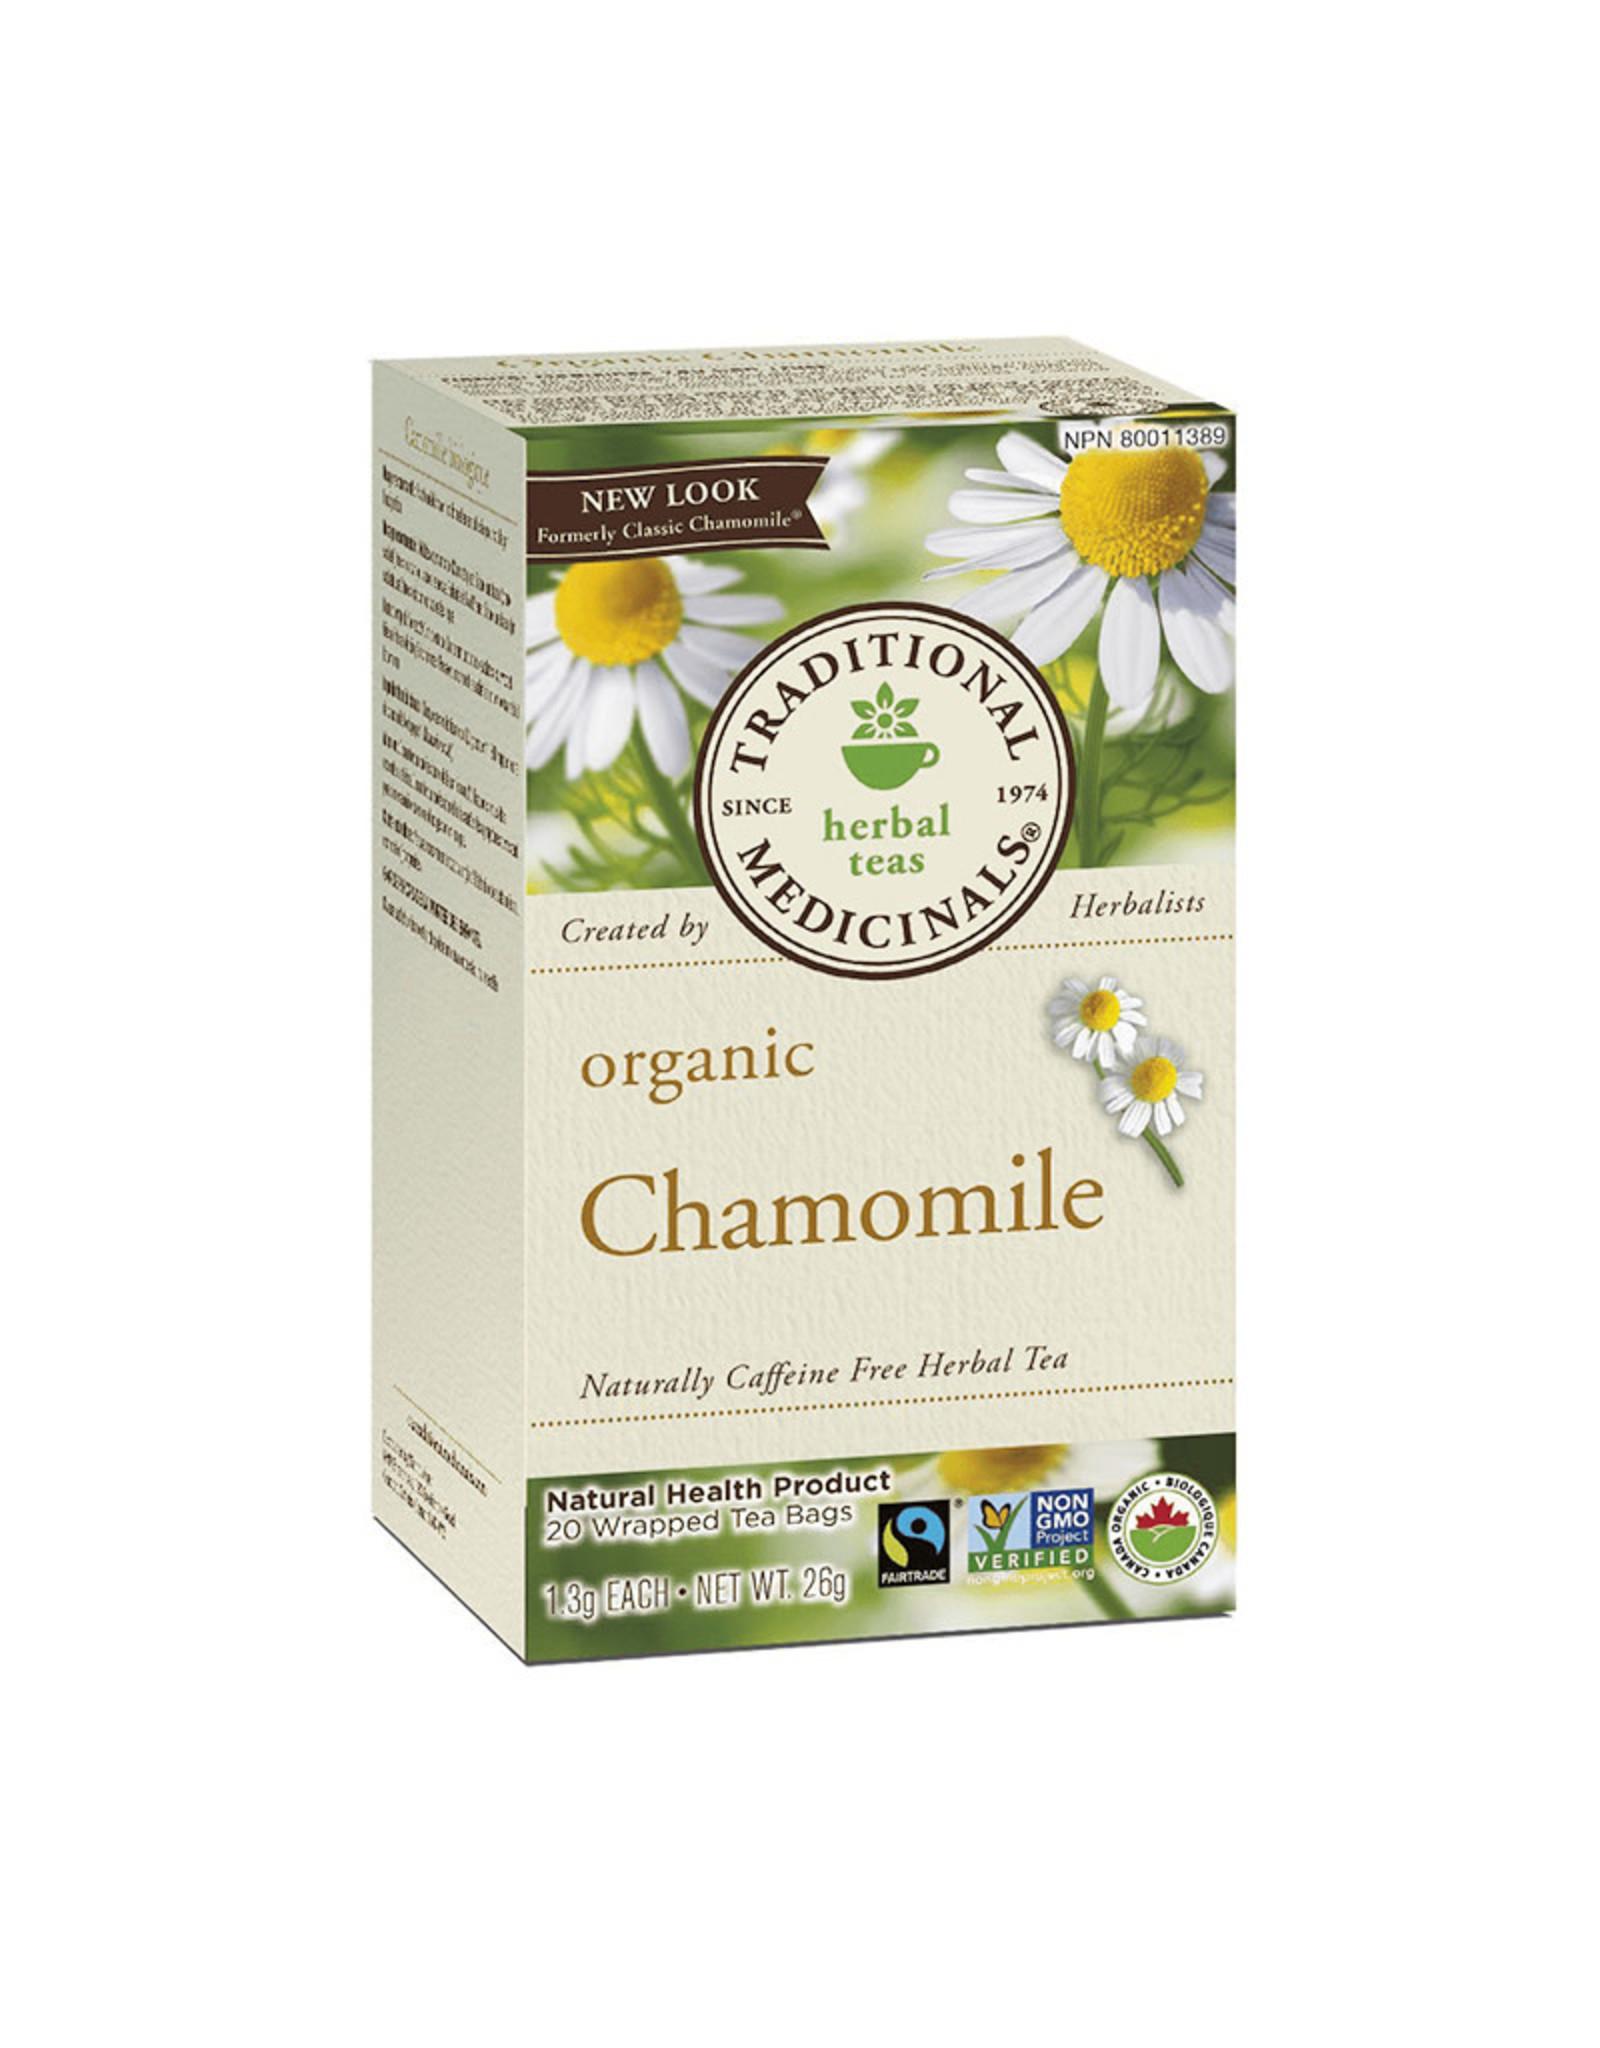 Traditional Medicinals Traditional Medicinals - Herbal Tea, Organic Chamomile